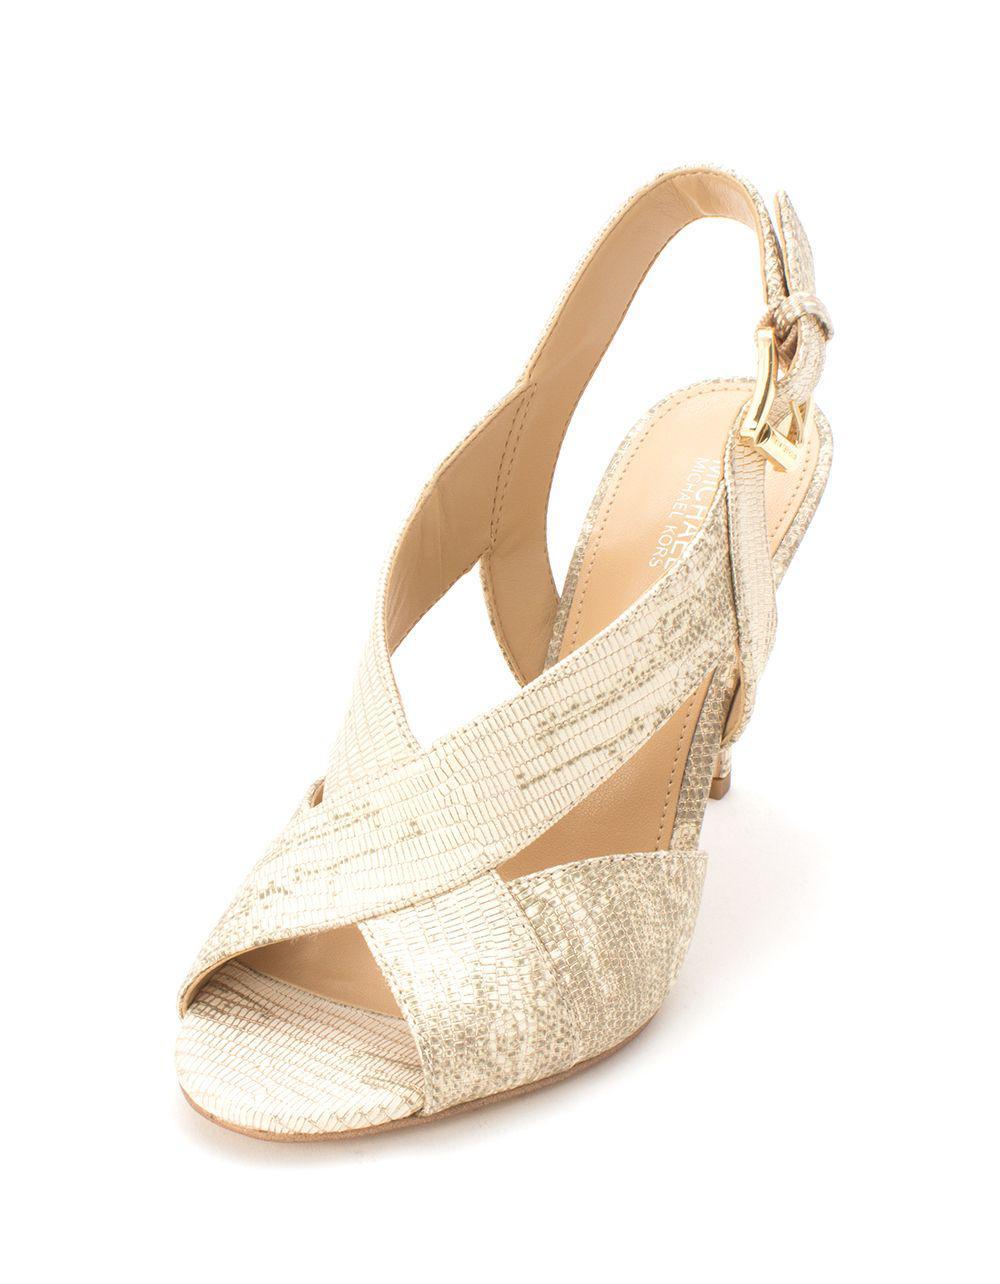 1b520651810a Michael Kors - Metallic Womens Becky Open Toe Casual Slingback Sandals -  Lyst. View fullscreen